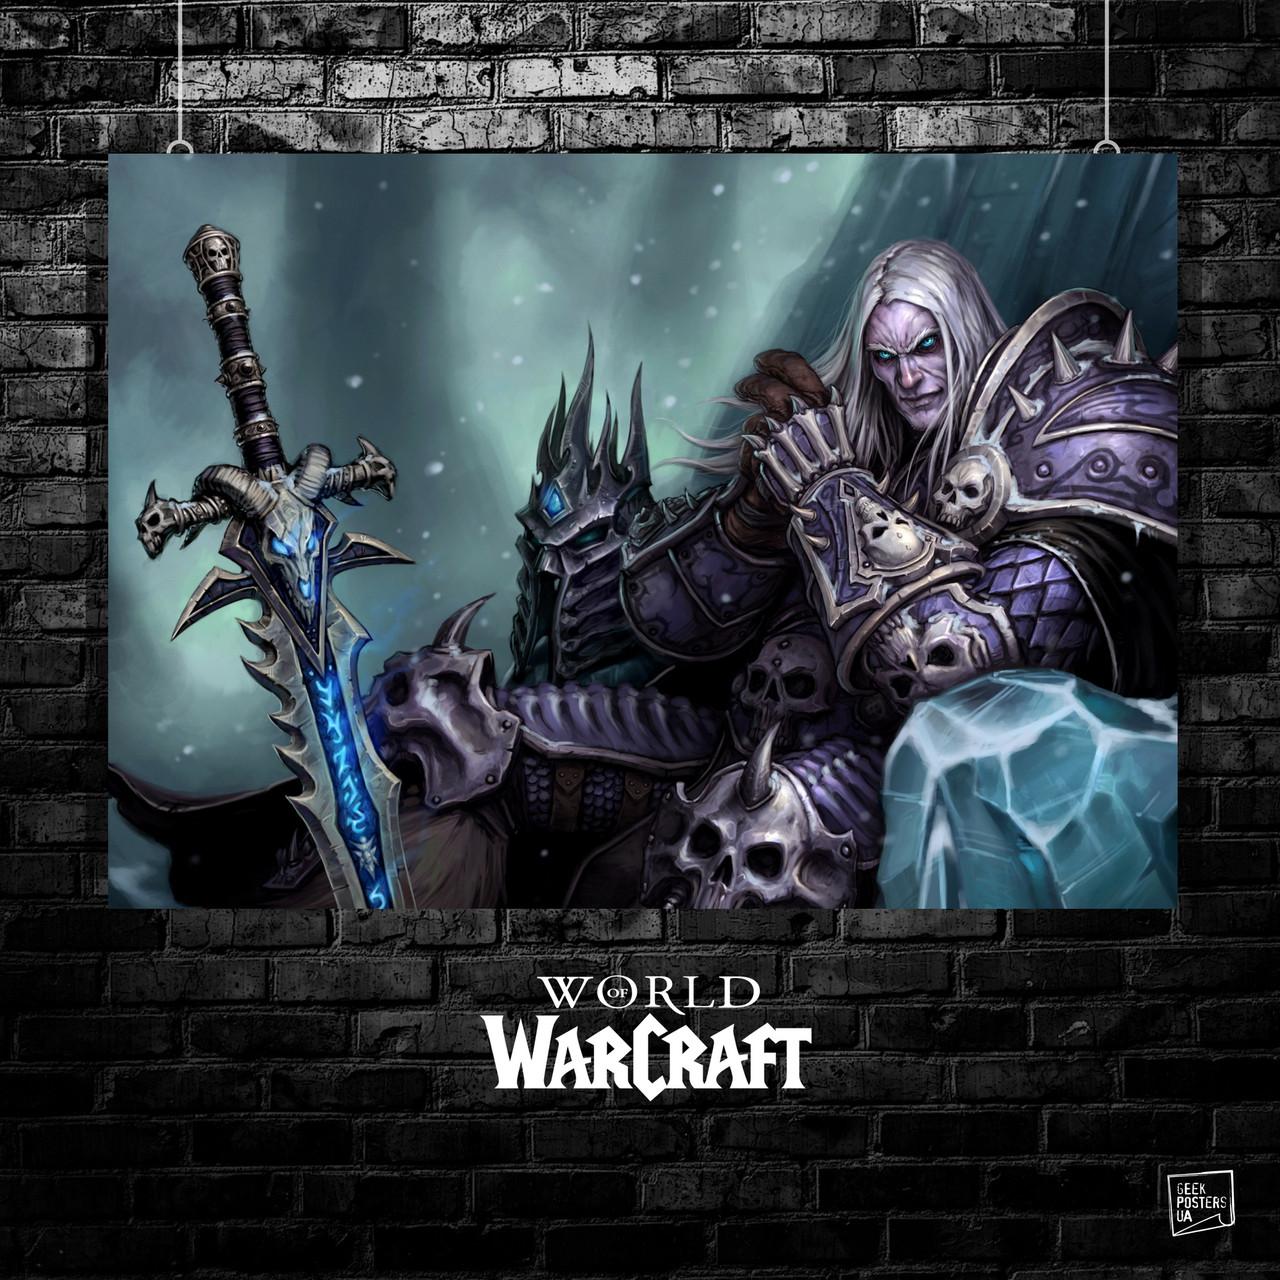 Постер Варкрафт, World of Warcraft, Король-Лич, Артас Менетил. Размер 60x42см (A2). Глянцевая бумага